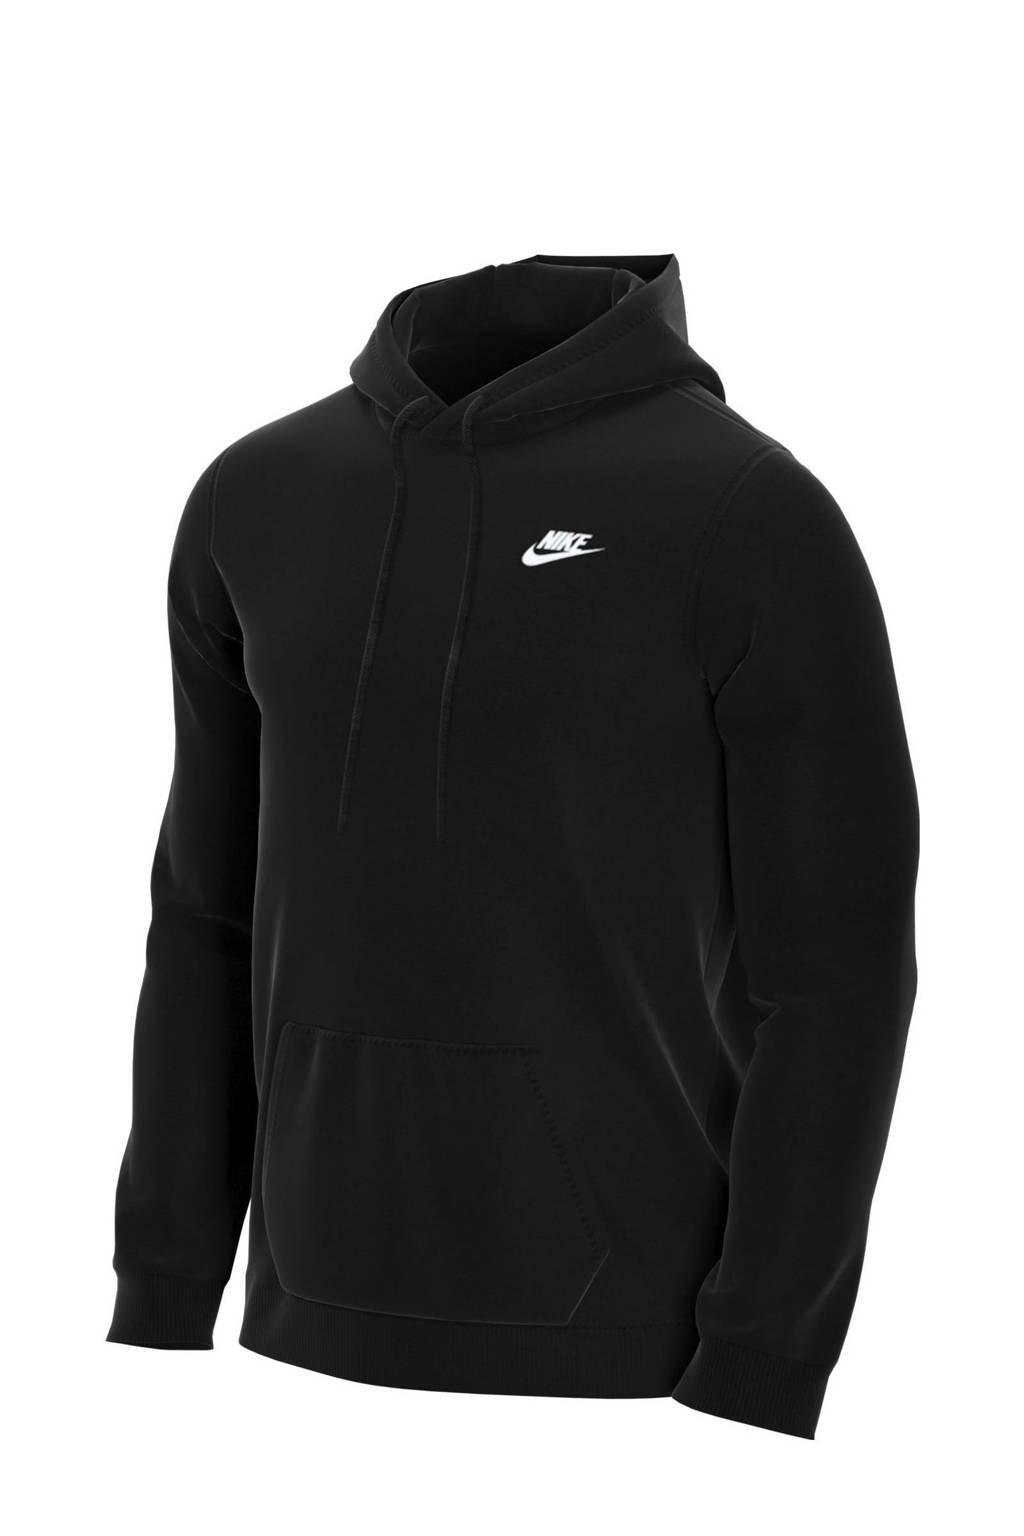 Nike hoodie zwart/wit, Zwart/wit